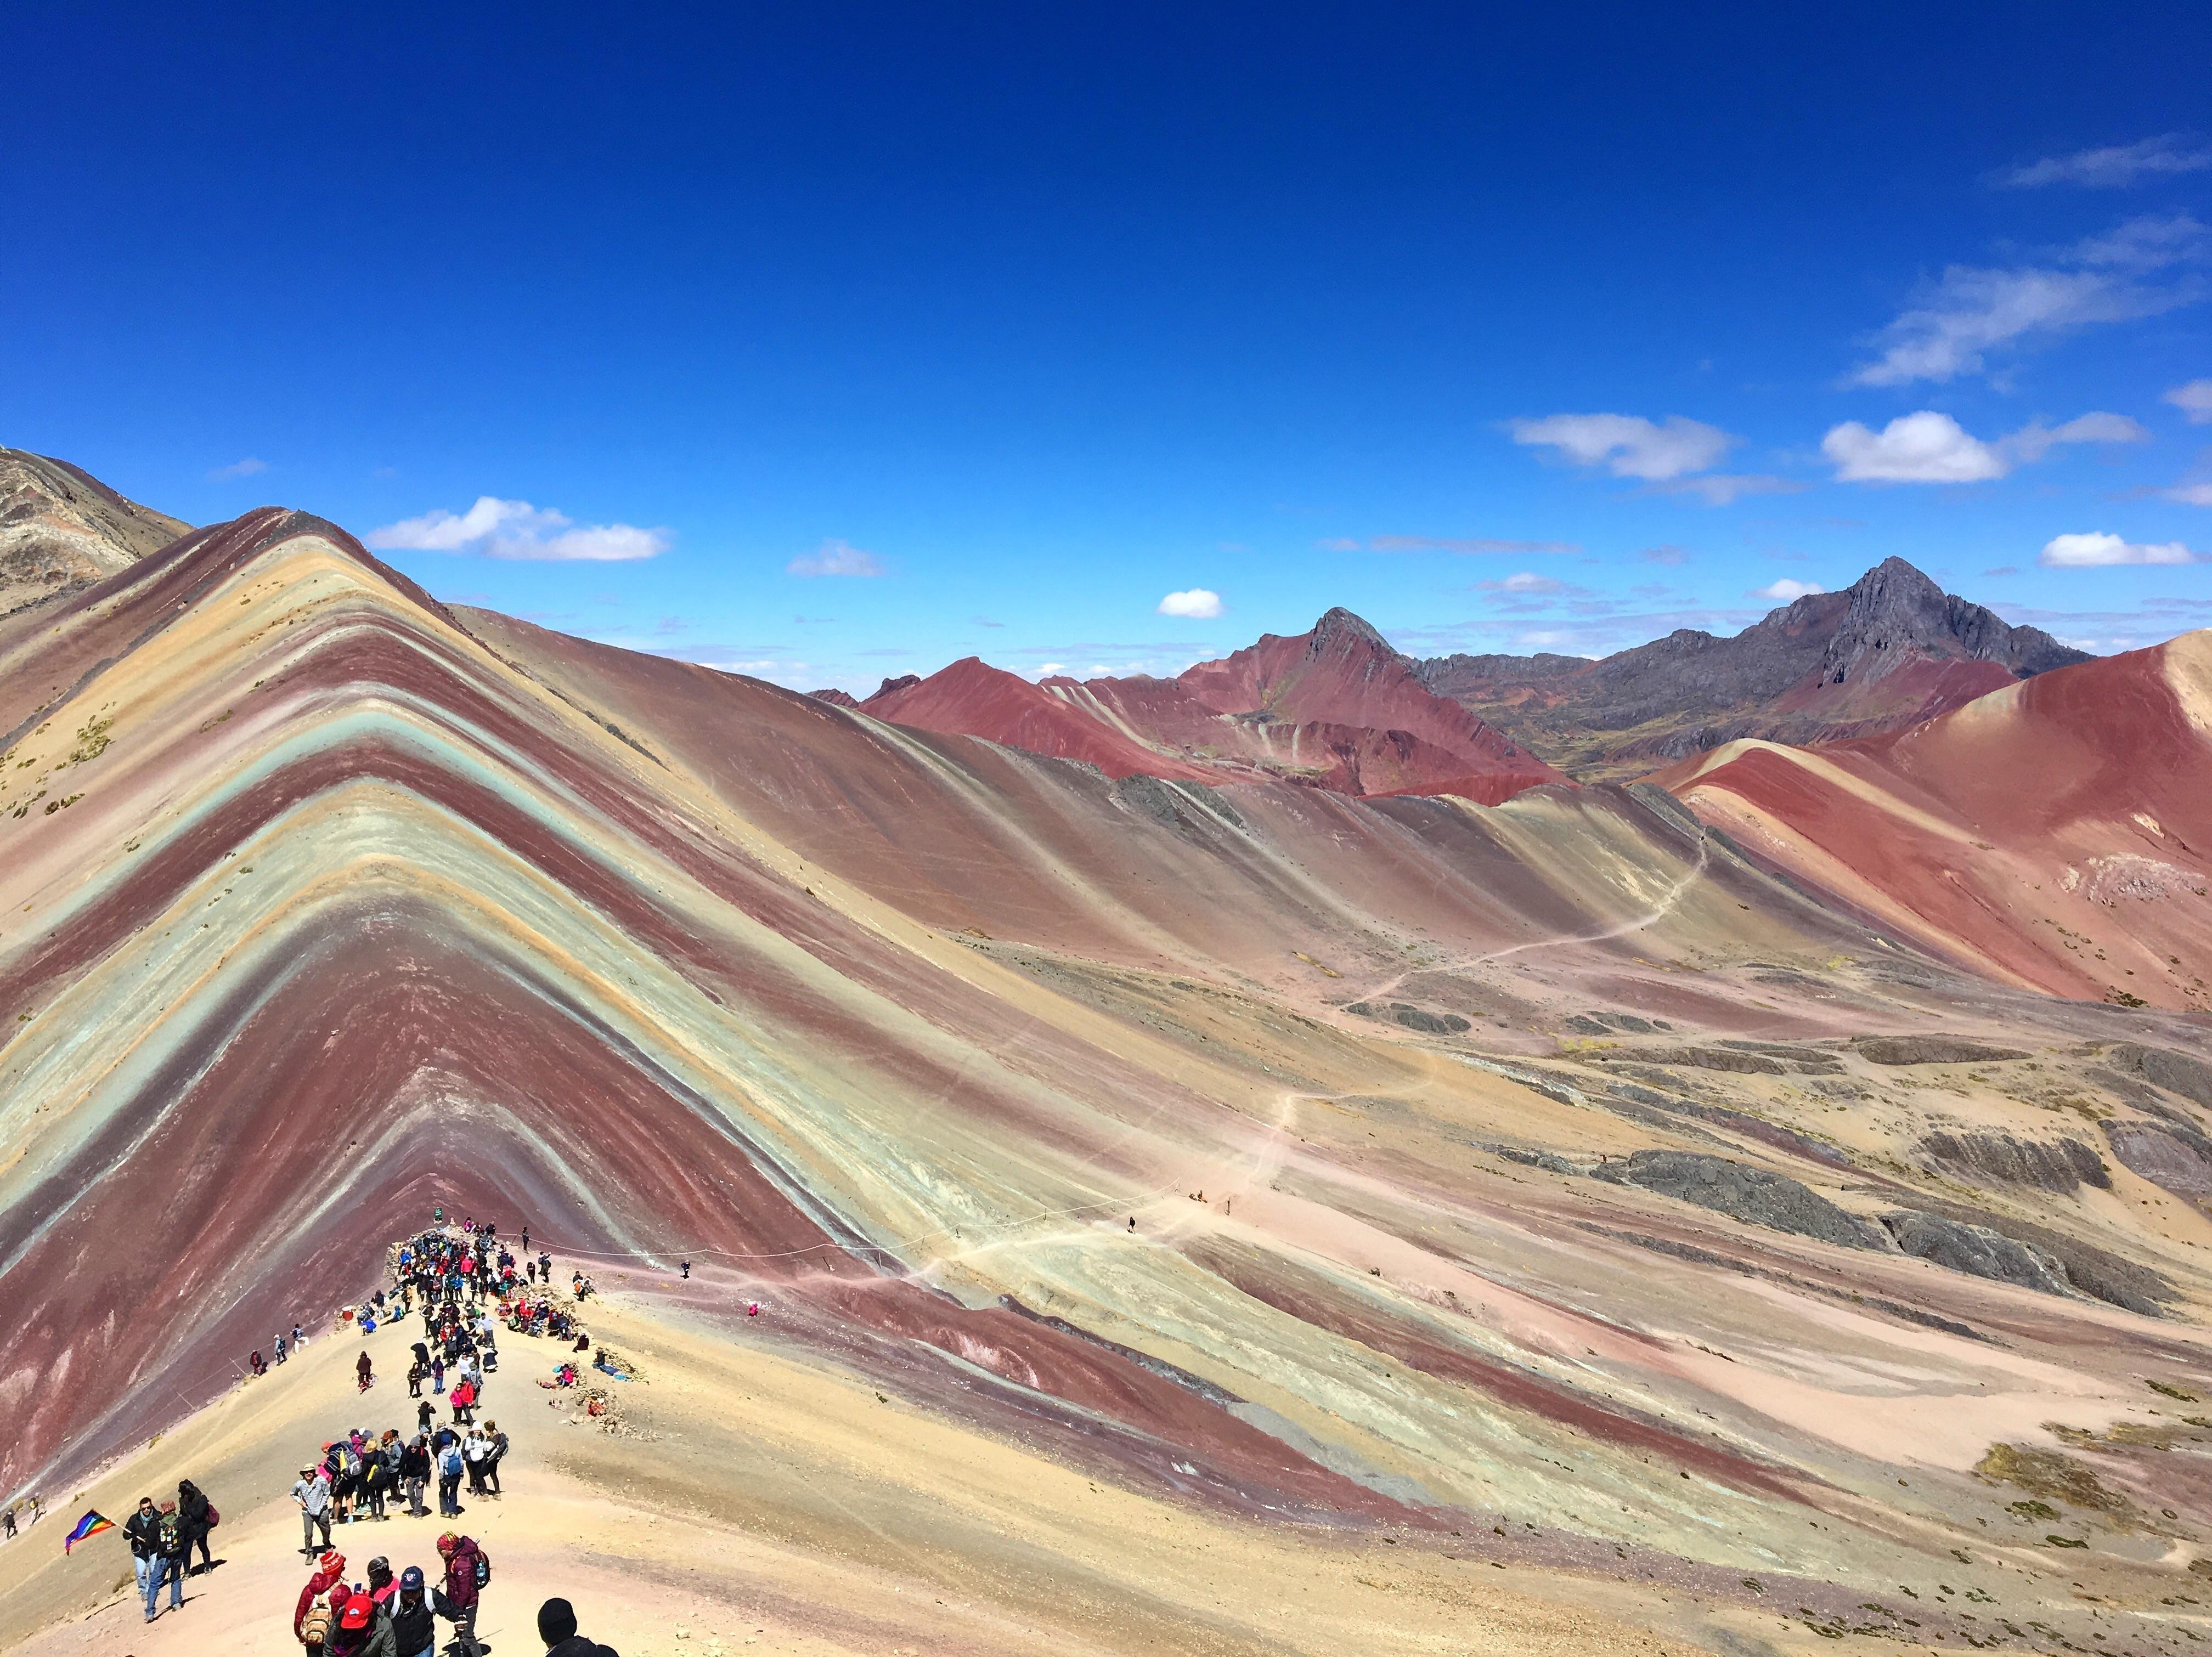 Vinicunca Rainbow Mountain Cusco Peru Https I Redd It 5ebro0ol5daz Jpg Rainbow Mountain South America Travel Destinations Cool Places To Visit